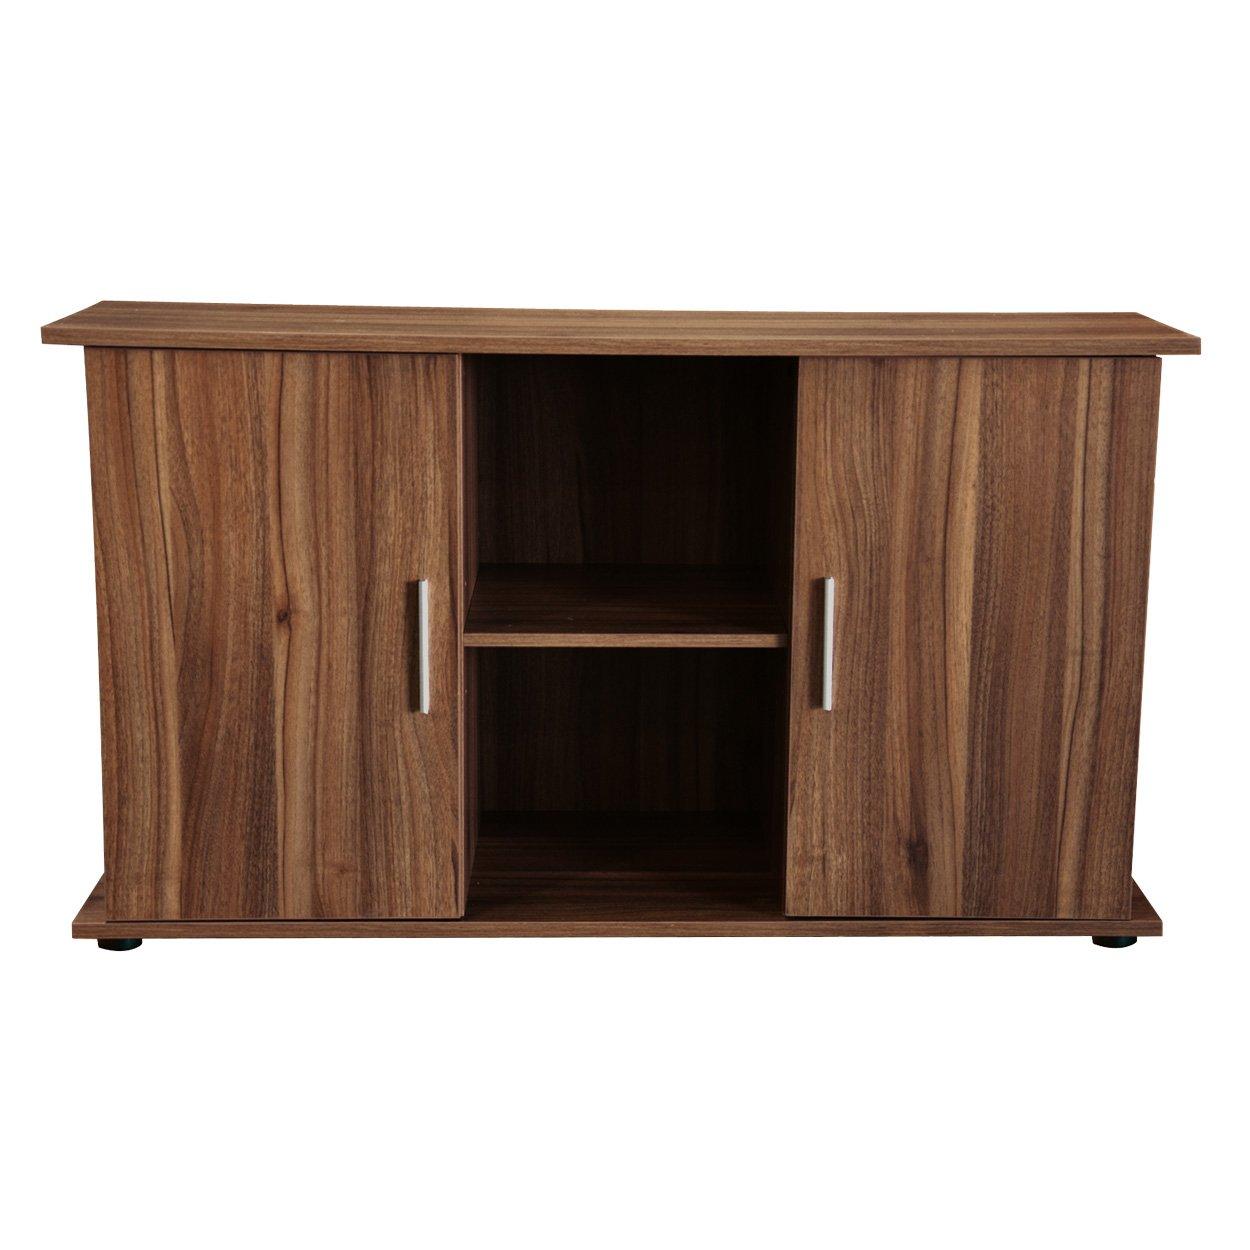 Seapora 52076 Empress Cabinet Stand, 48″ x 12″, Dark Oak